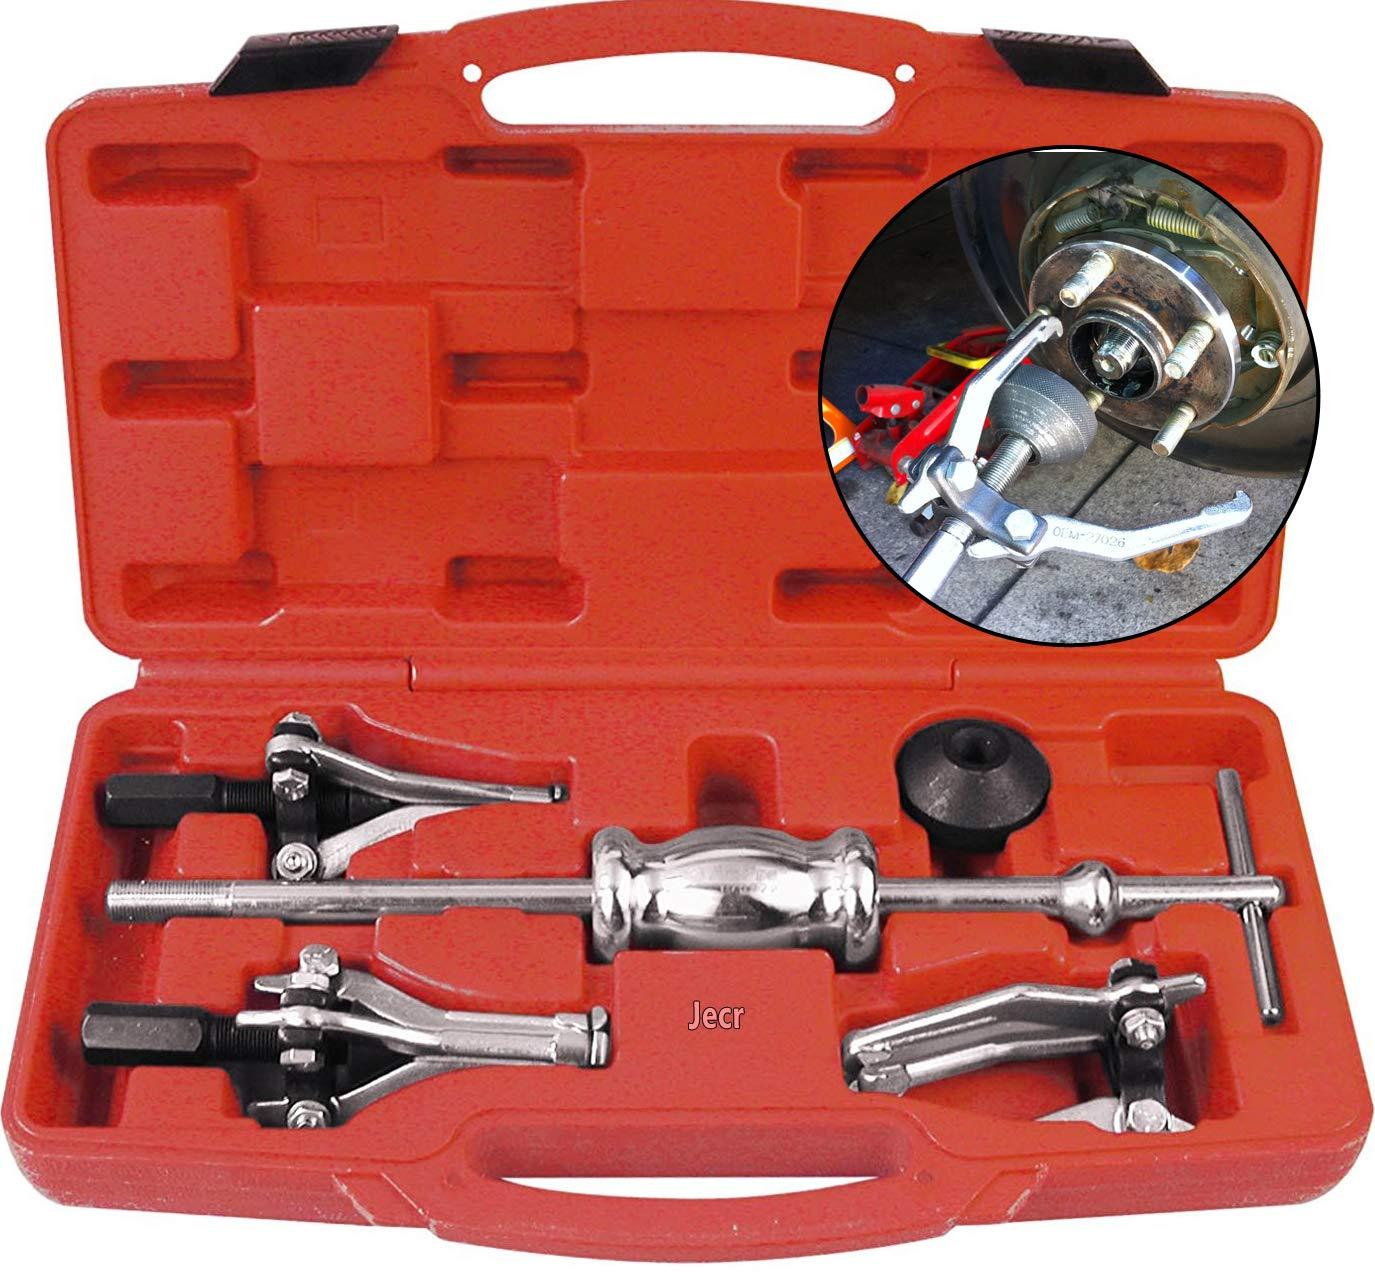 Jecr Slide Hammer Puller Set - Internal and External 3 Jaw Bearing and Bushing Pulling Tool Kit - Three Leg Slide Hammer Puller Set With Case - For bearings, bushings, seals, retainers, etc.